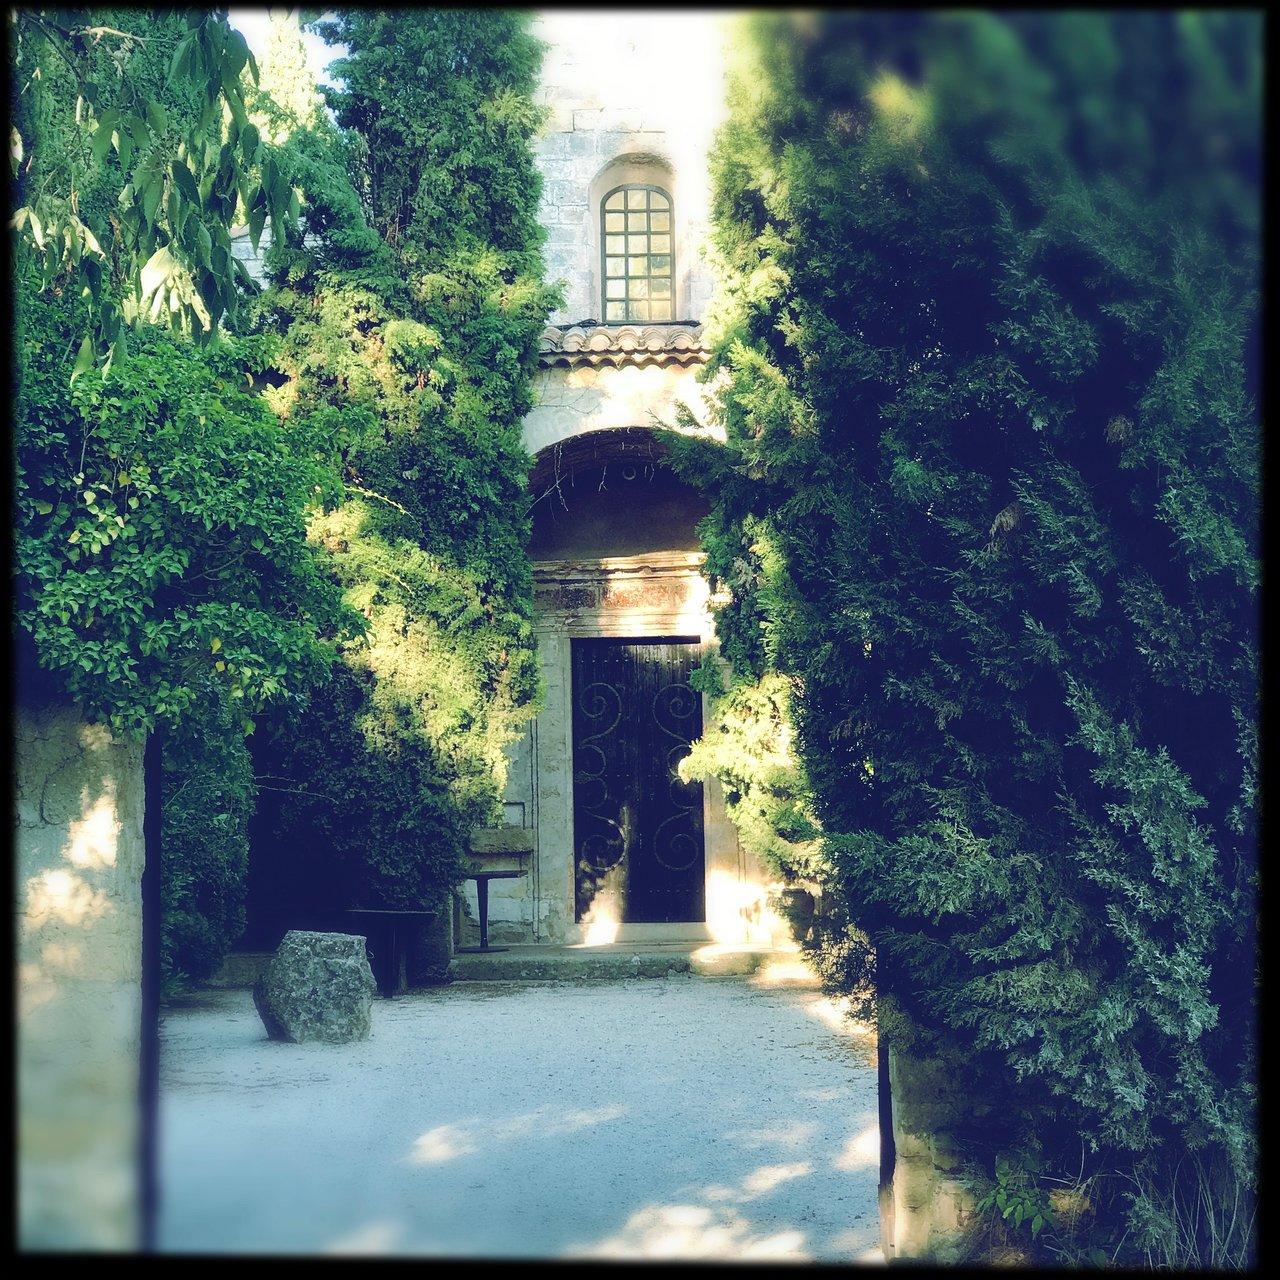 abbaye de sainte croix salon de provence GARRIGAE ABBAYE DE SAINTE CROIX $125 ($̶1̶7̶0̶) - Updated 2019 Prices u0026  Hotel Reviews - Salon-de-Provence, France - TripAdvisor